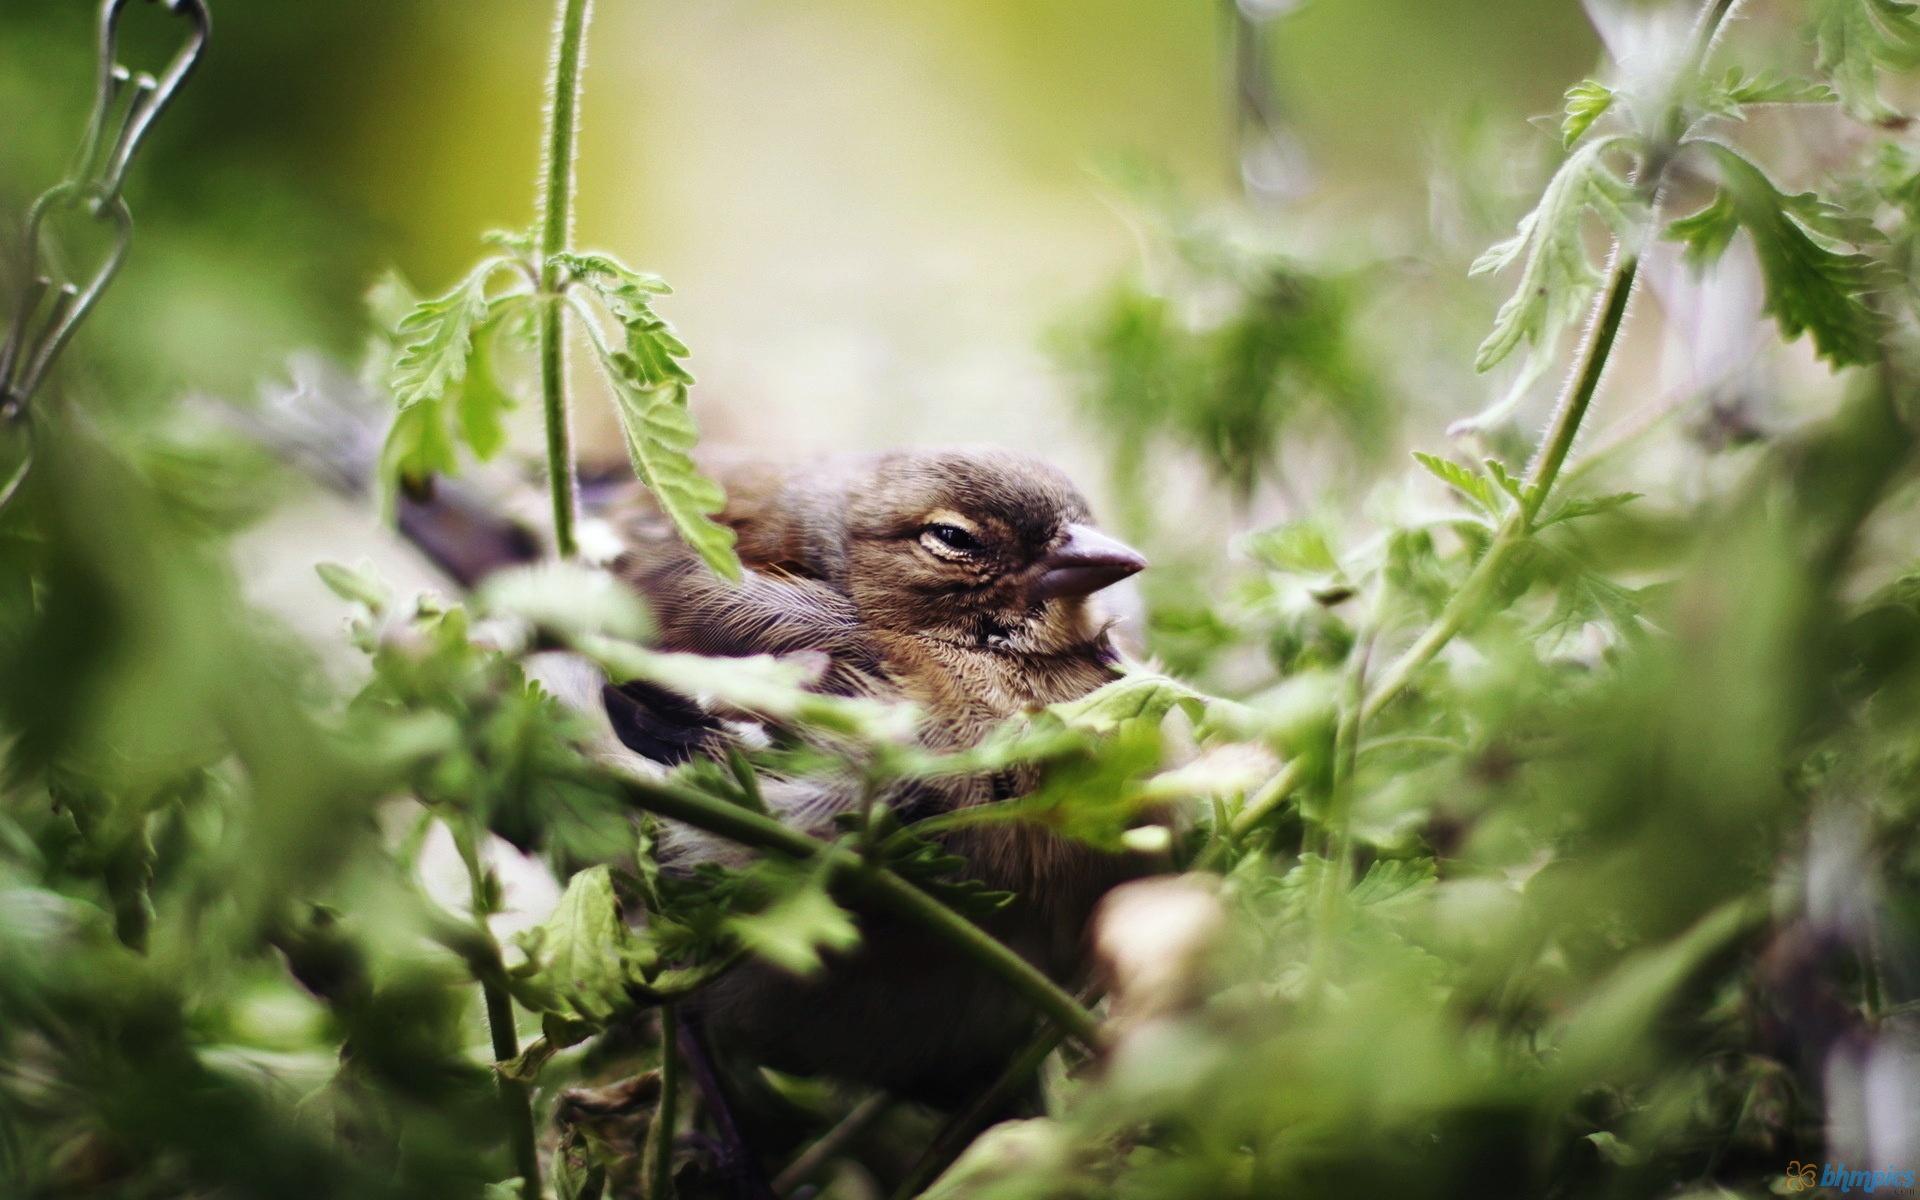 Little Brooding Bird